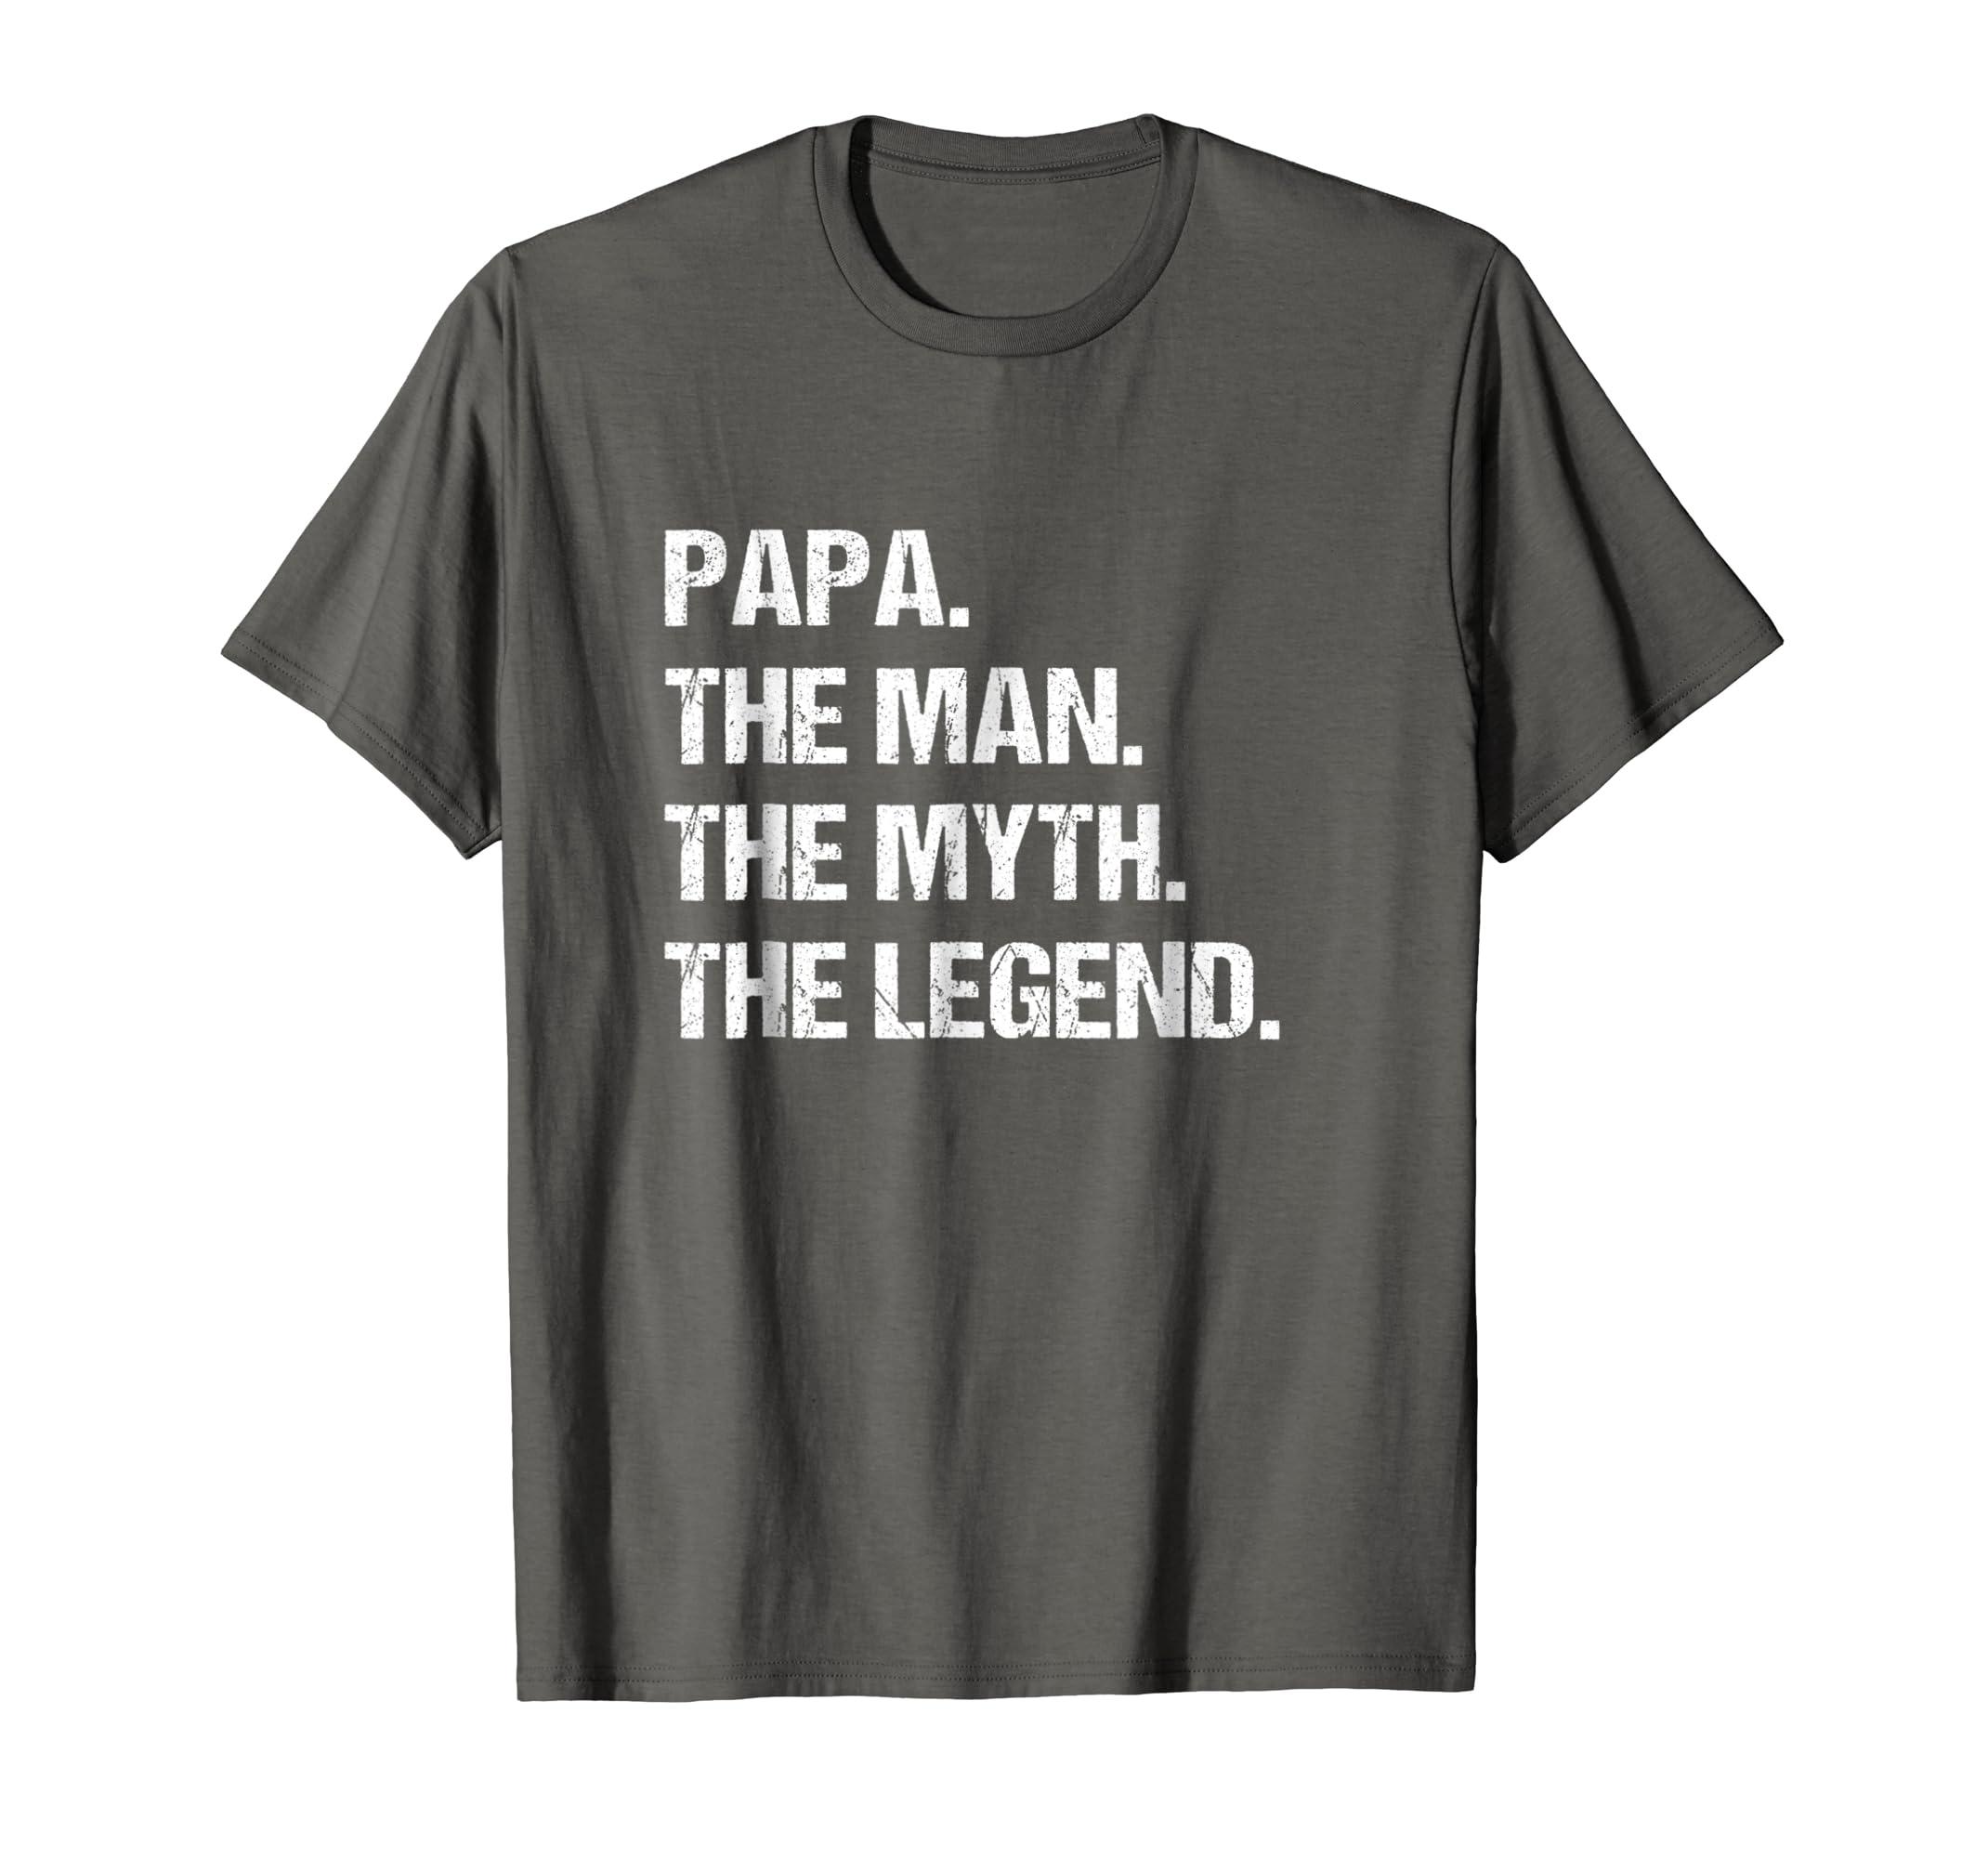 d6315844 PAPA – THE MAN MYTH LEGEND Shirt, Gift Fathers Day Tshirt – Paramatee